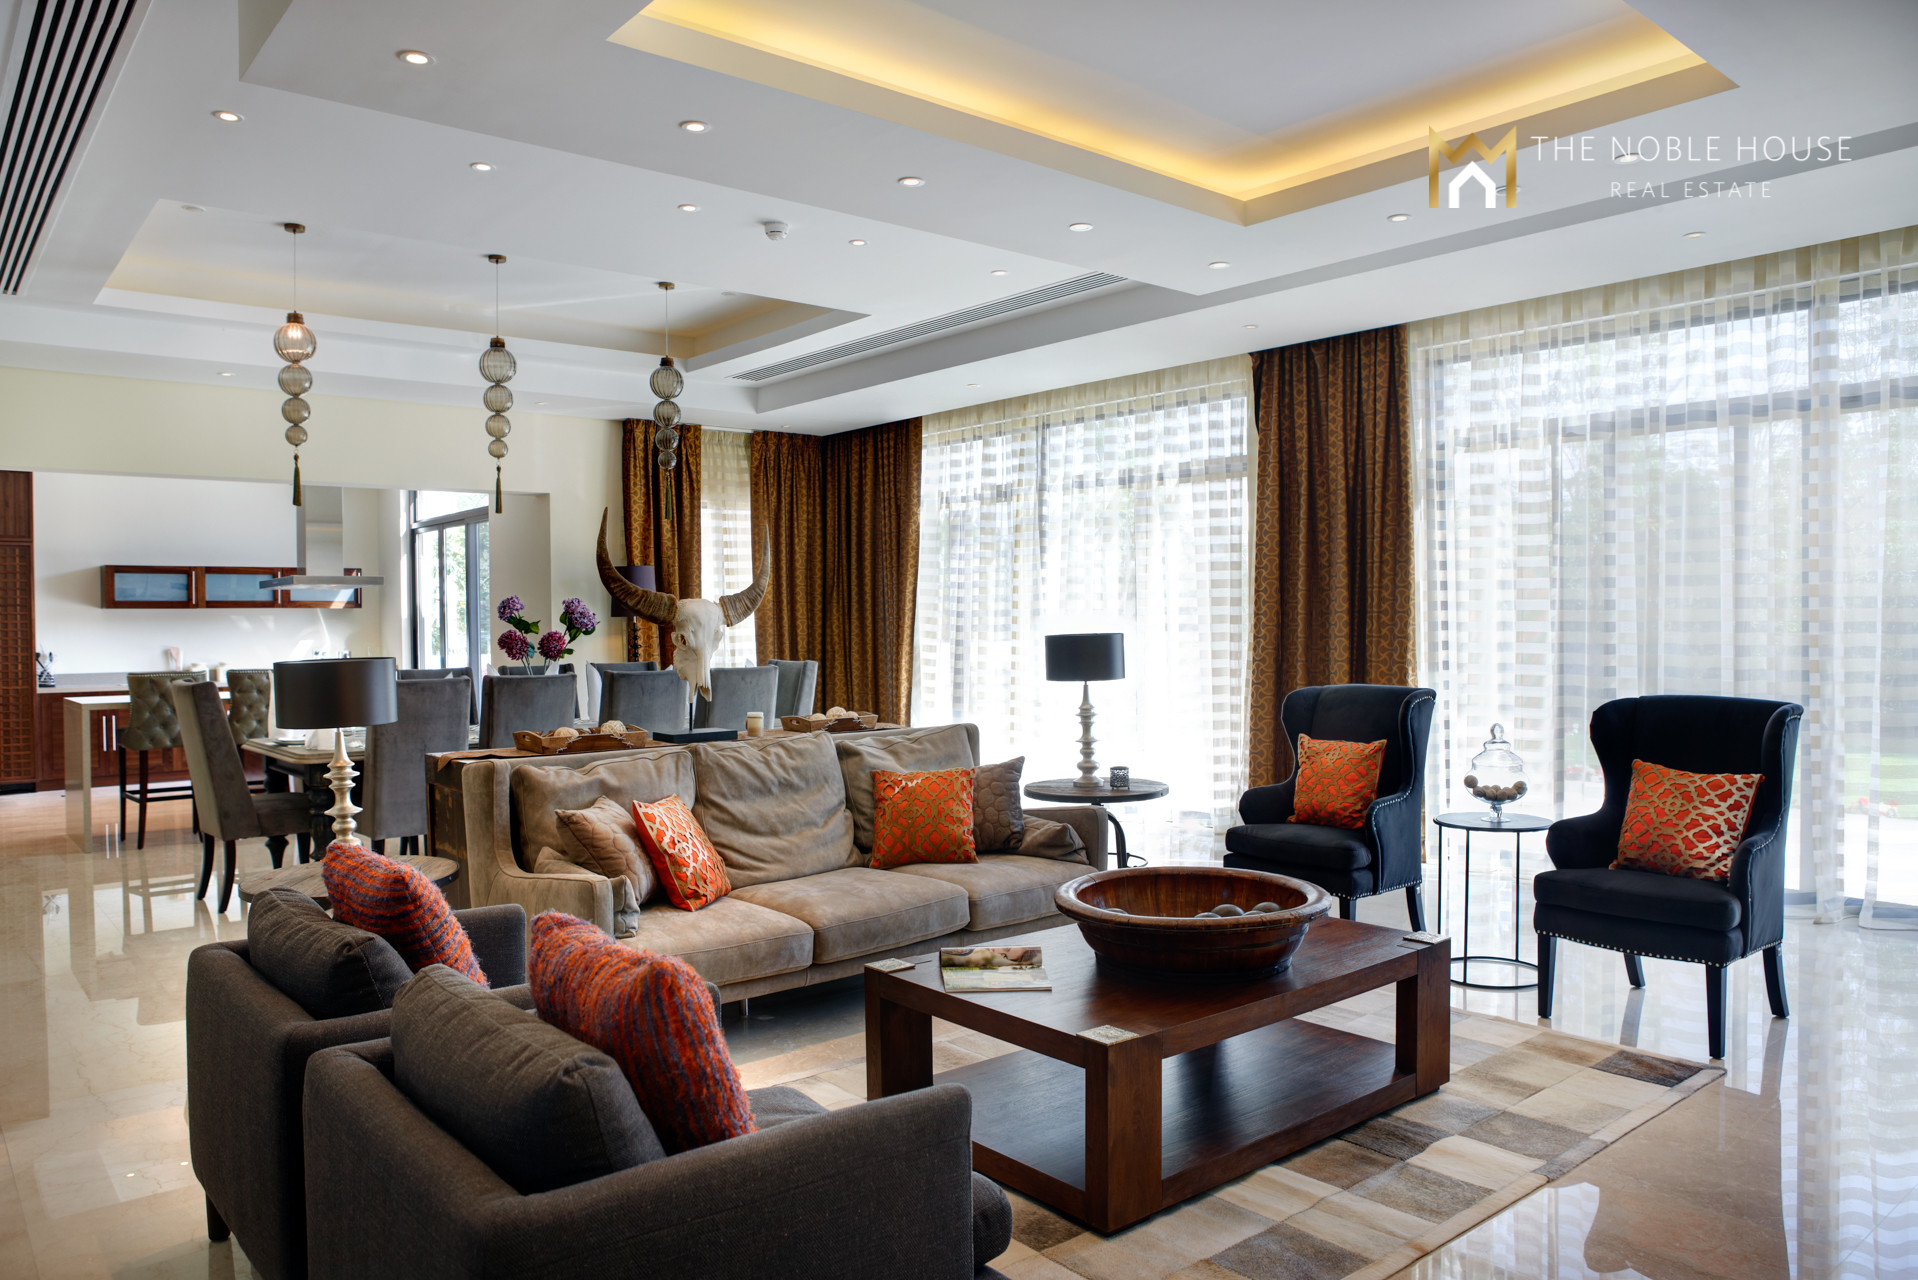 6 Bed Type A Modern Arabic Villa In MBRC